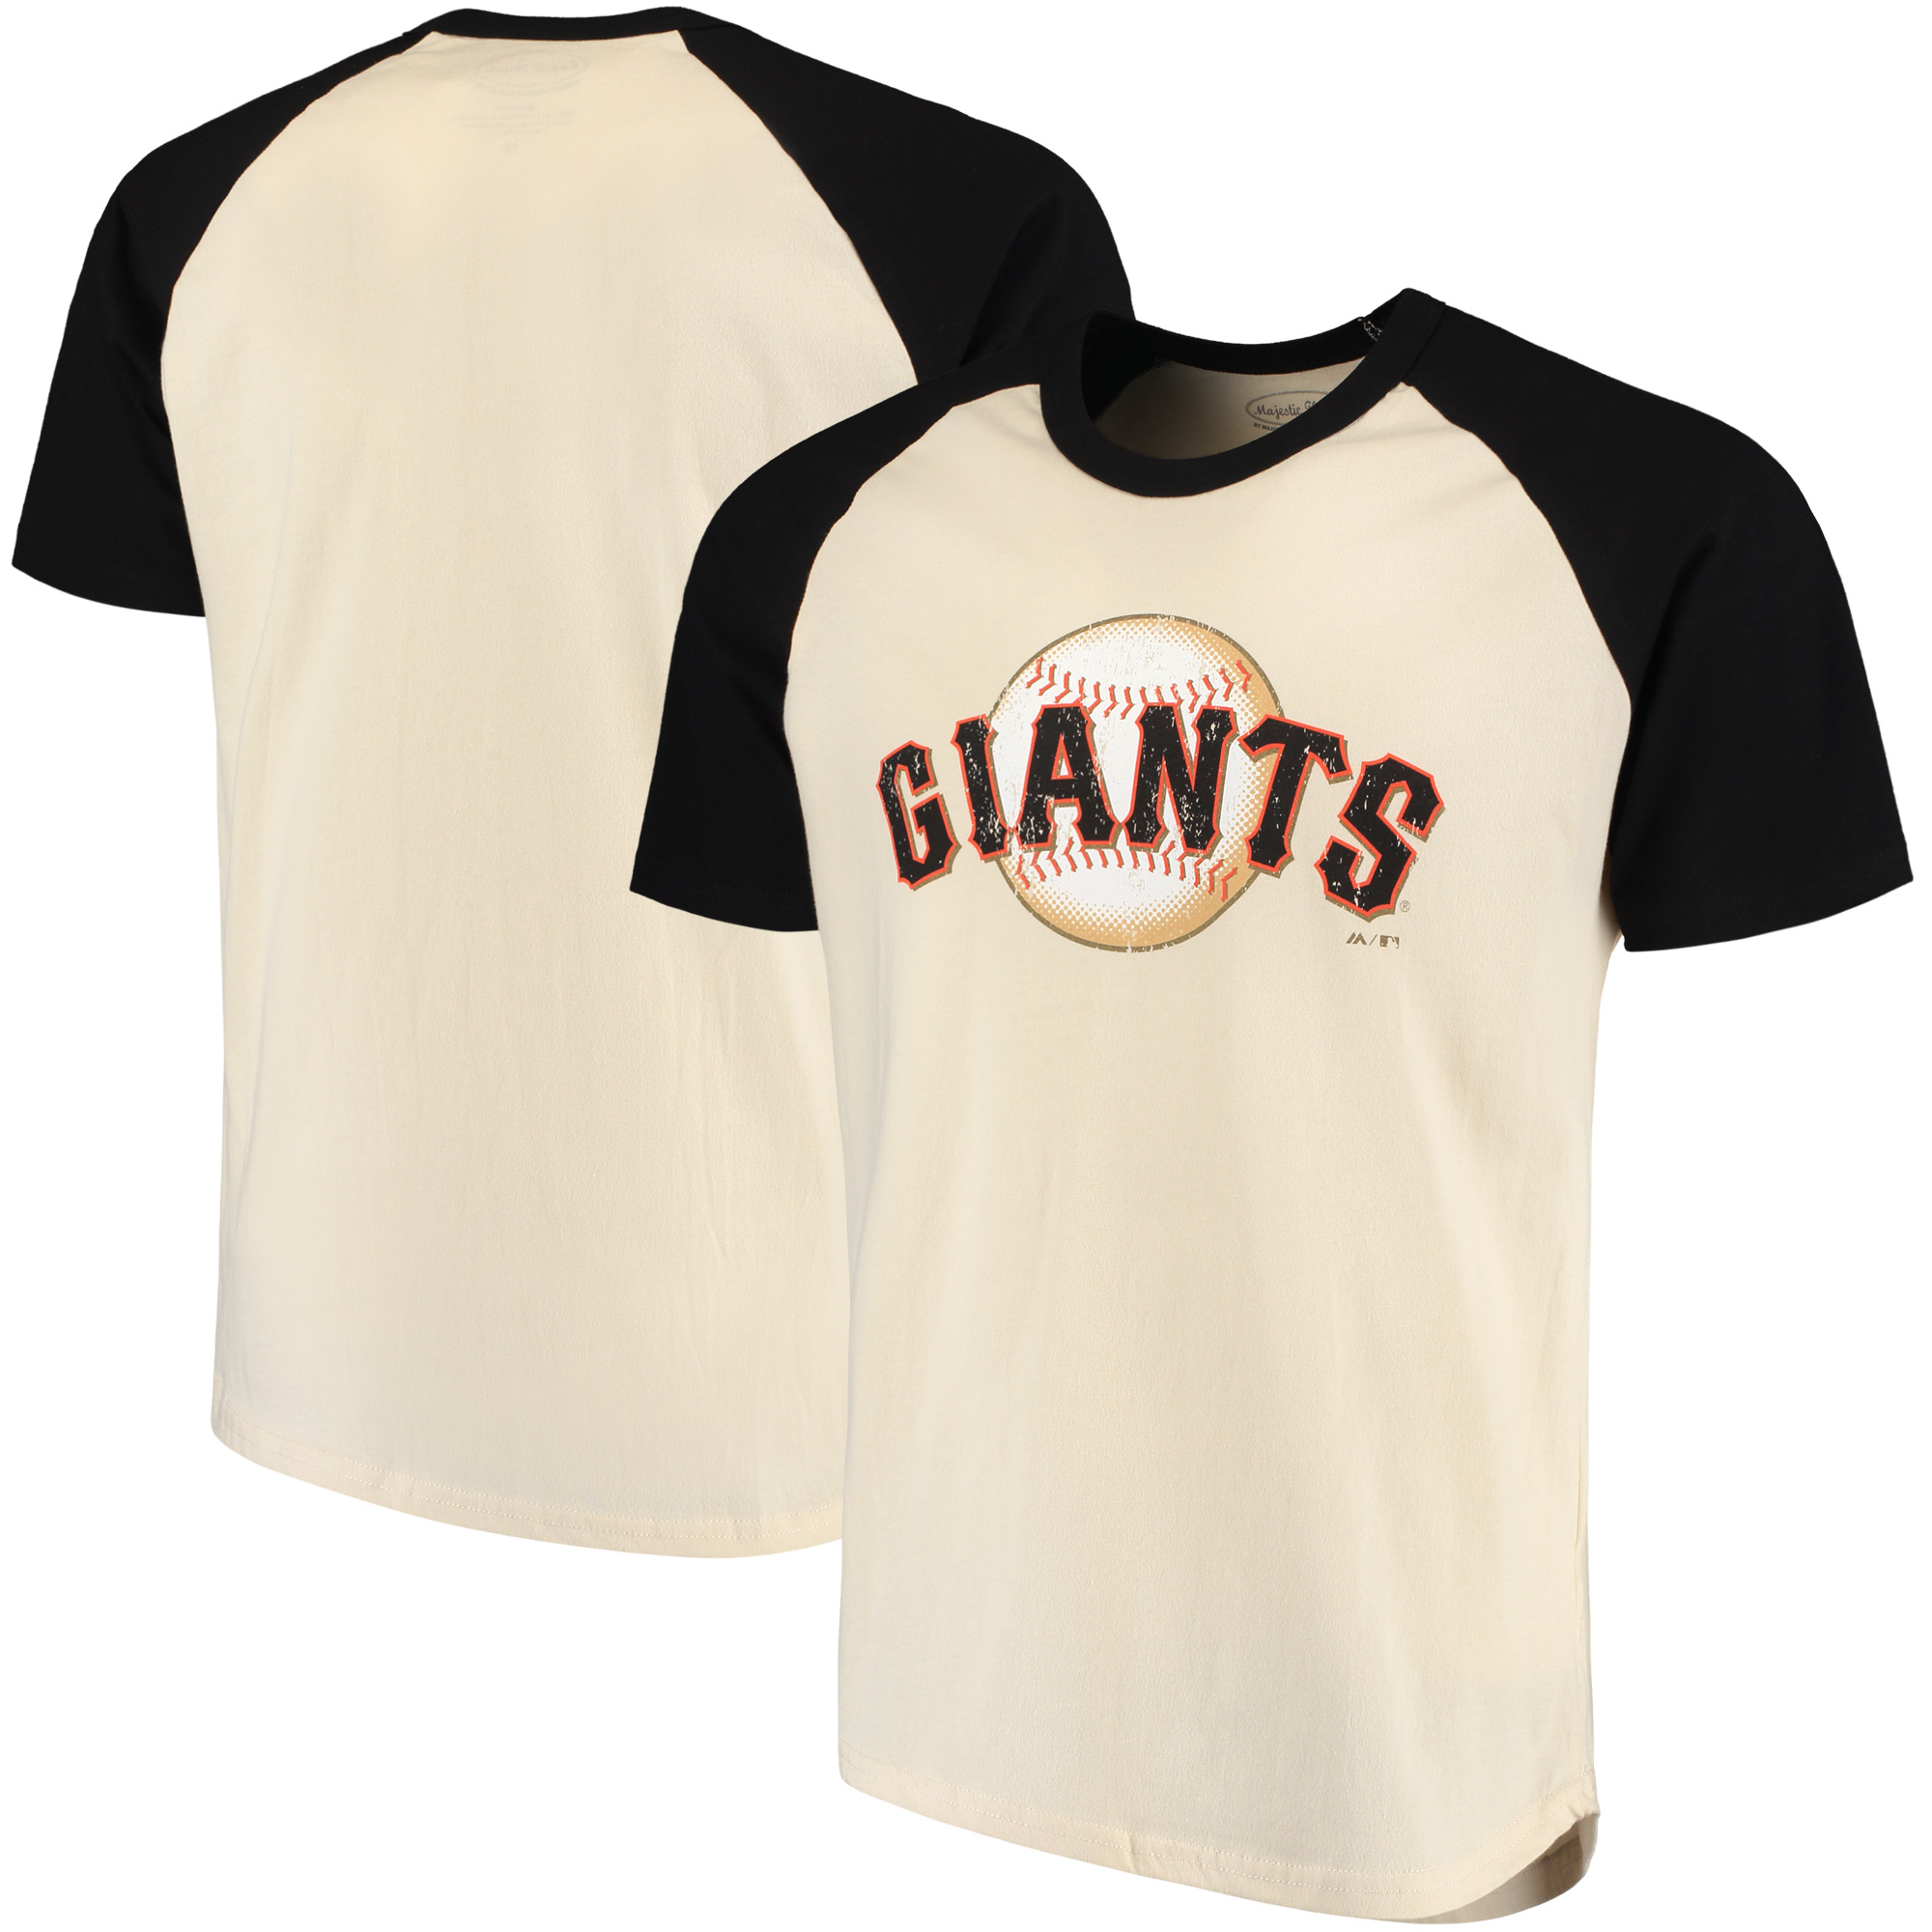 San Francisco Giants Majestic Threads Softhand Raglan T-Shirt - Cream/Black